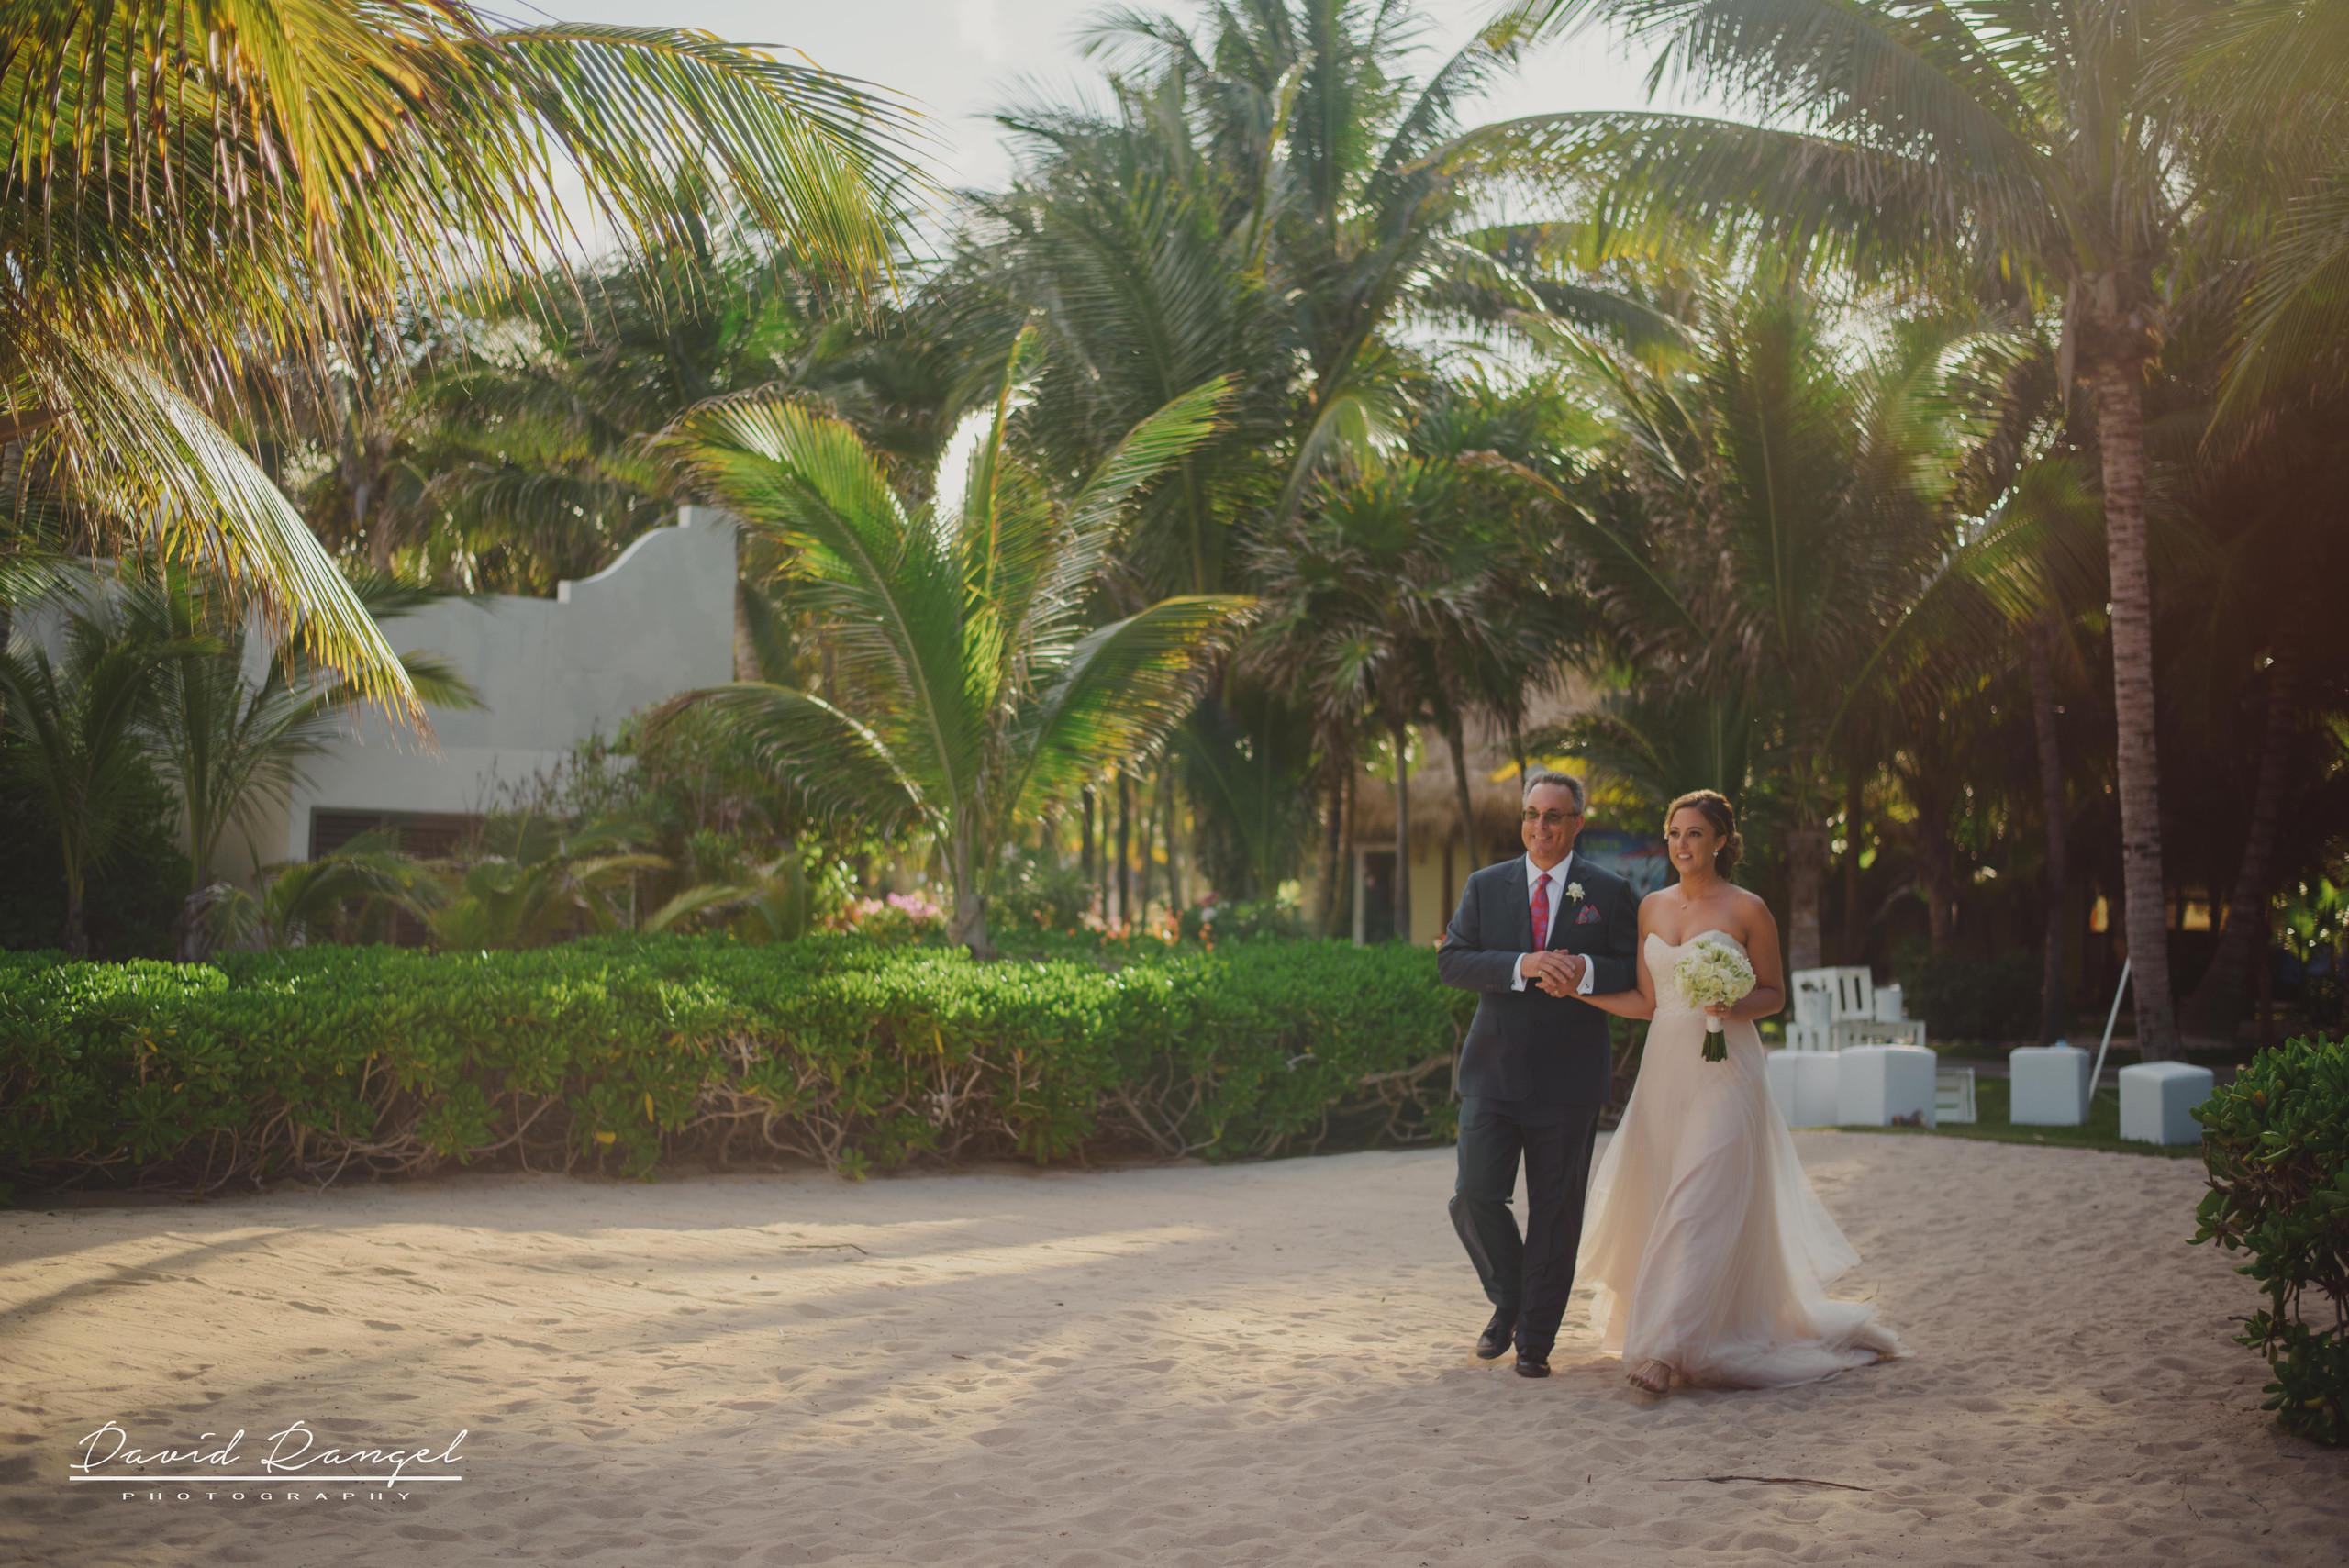 wedding+gazebo+beach+ceremony+photo+bride+aisle+walk+father